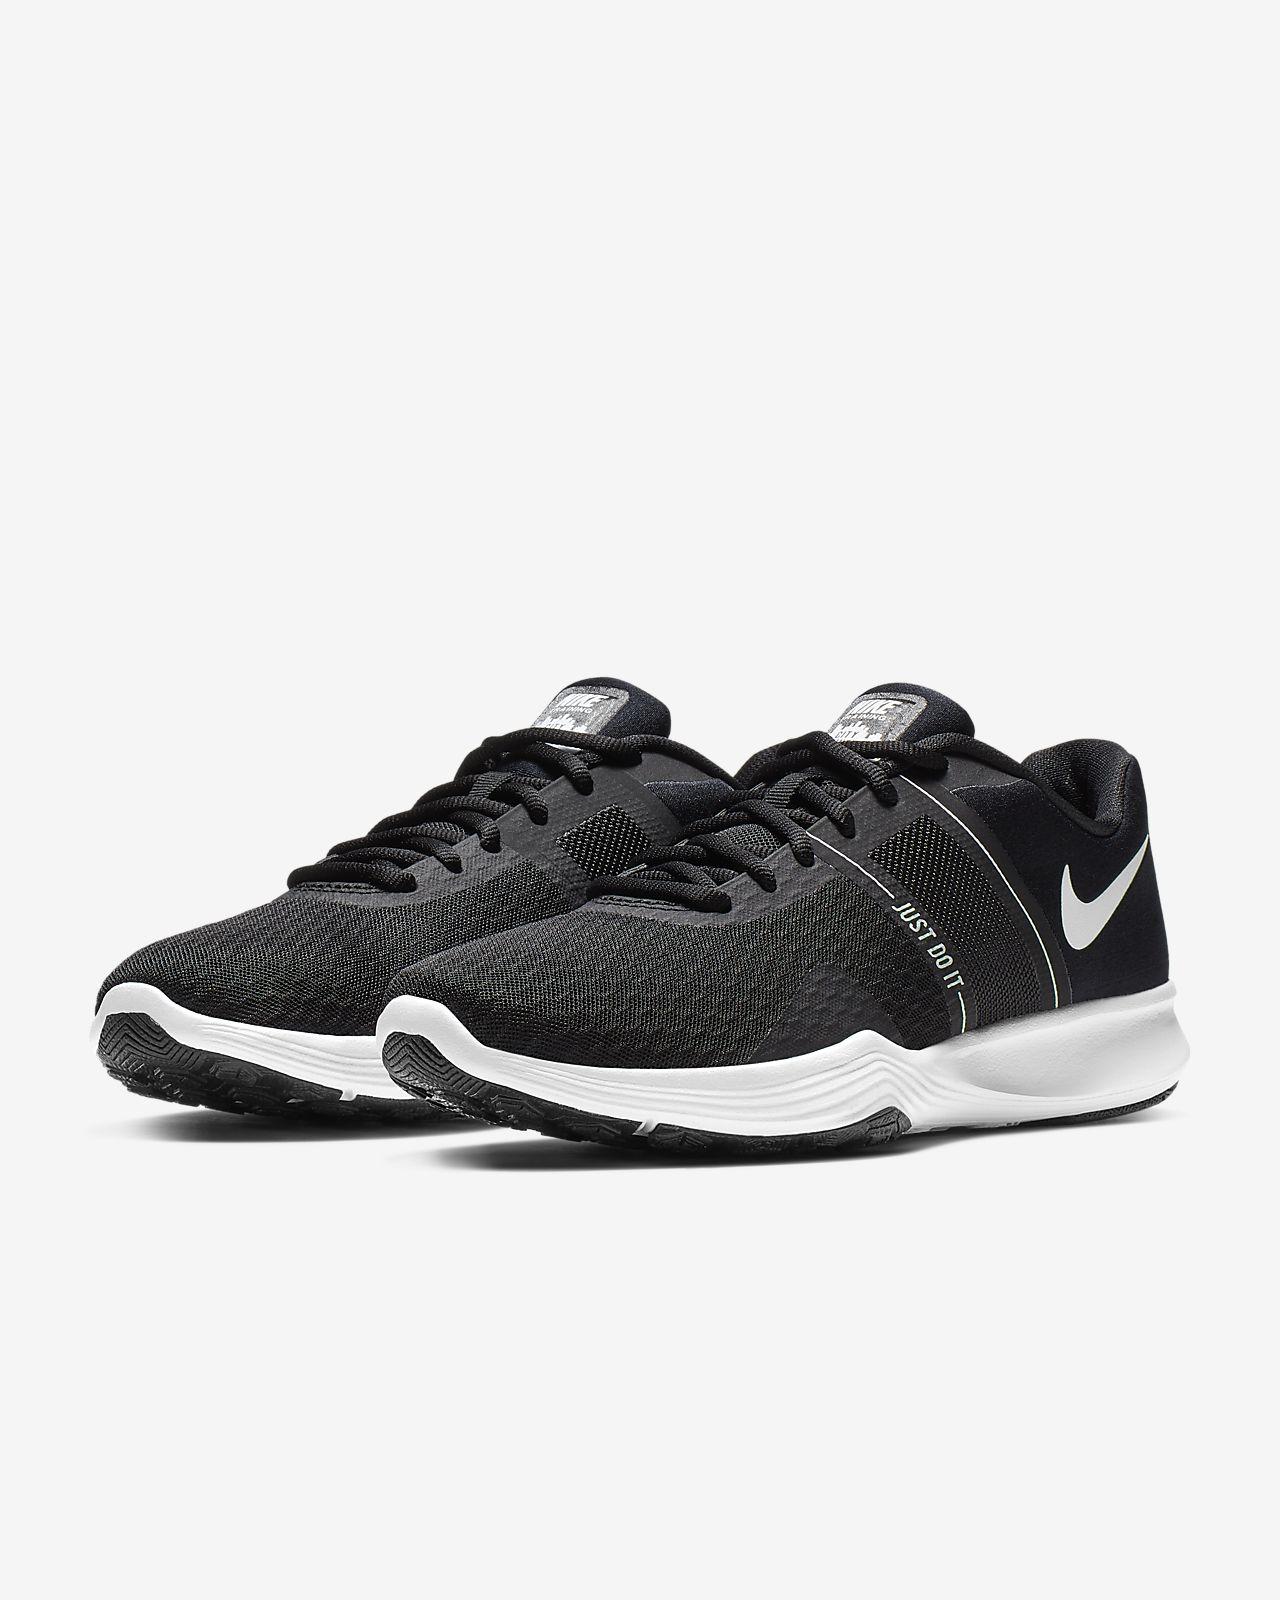 42b5171ecb121 Nike City Trainer 2 Women's Training Shoe. Nike.com GB